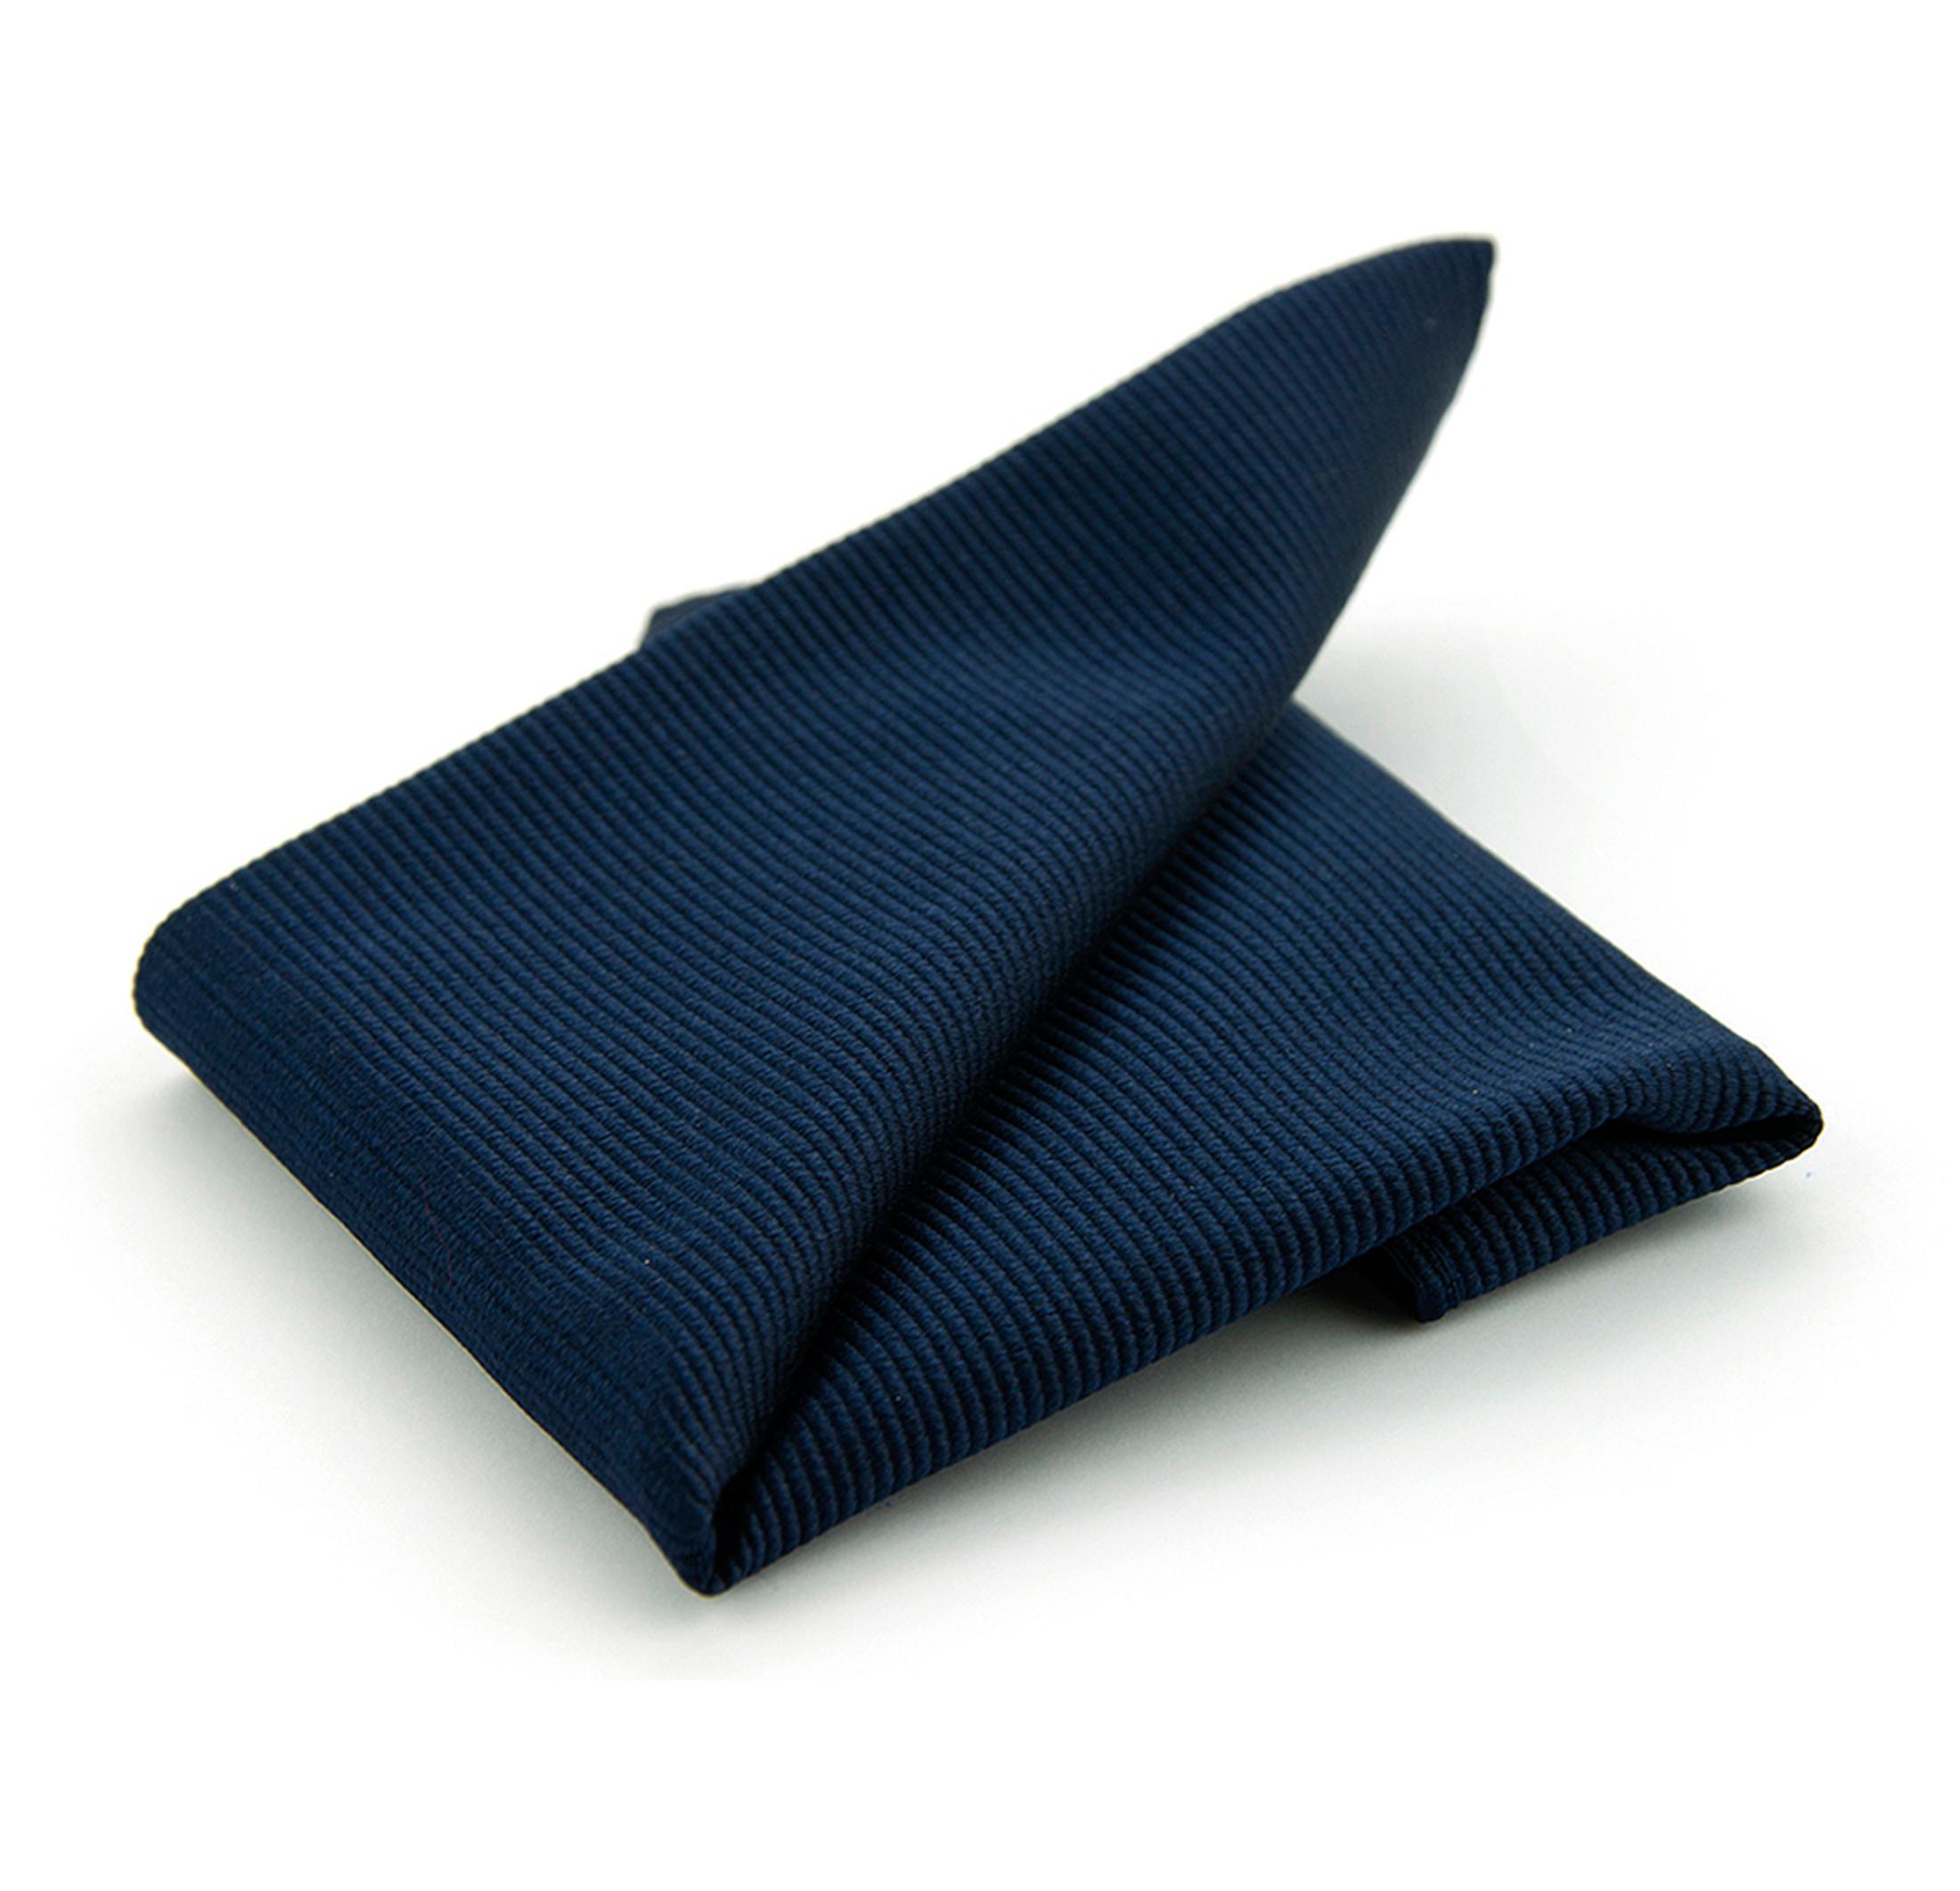 Einstecktuch Seide Marineblau F35 foto 0